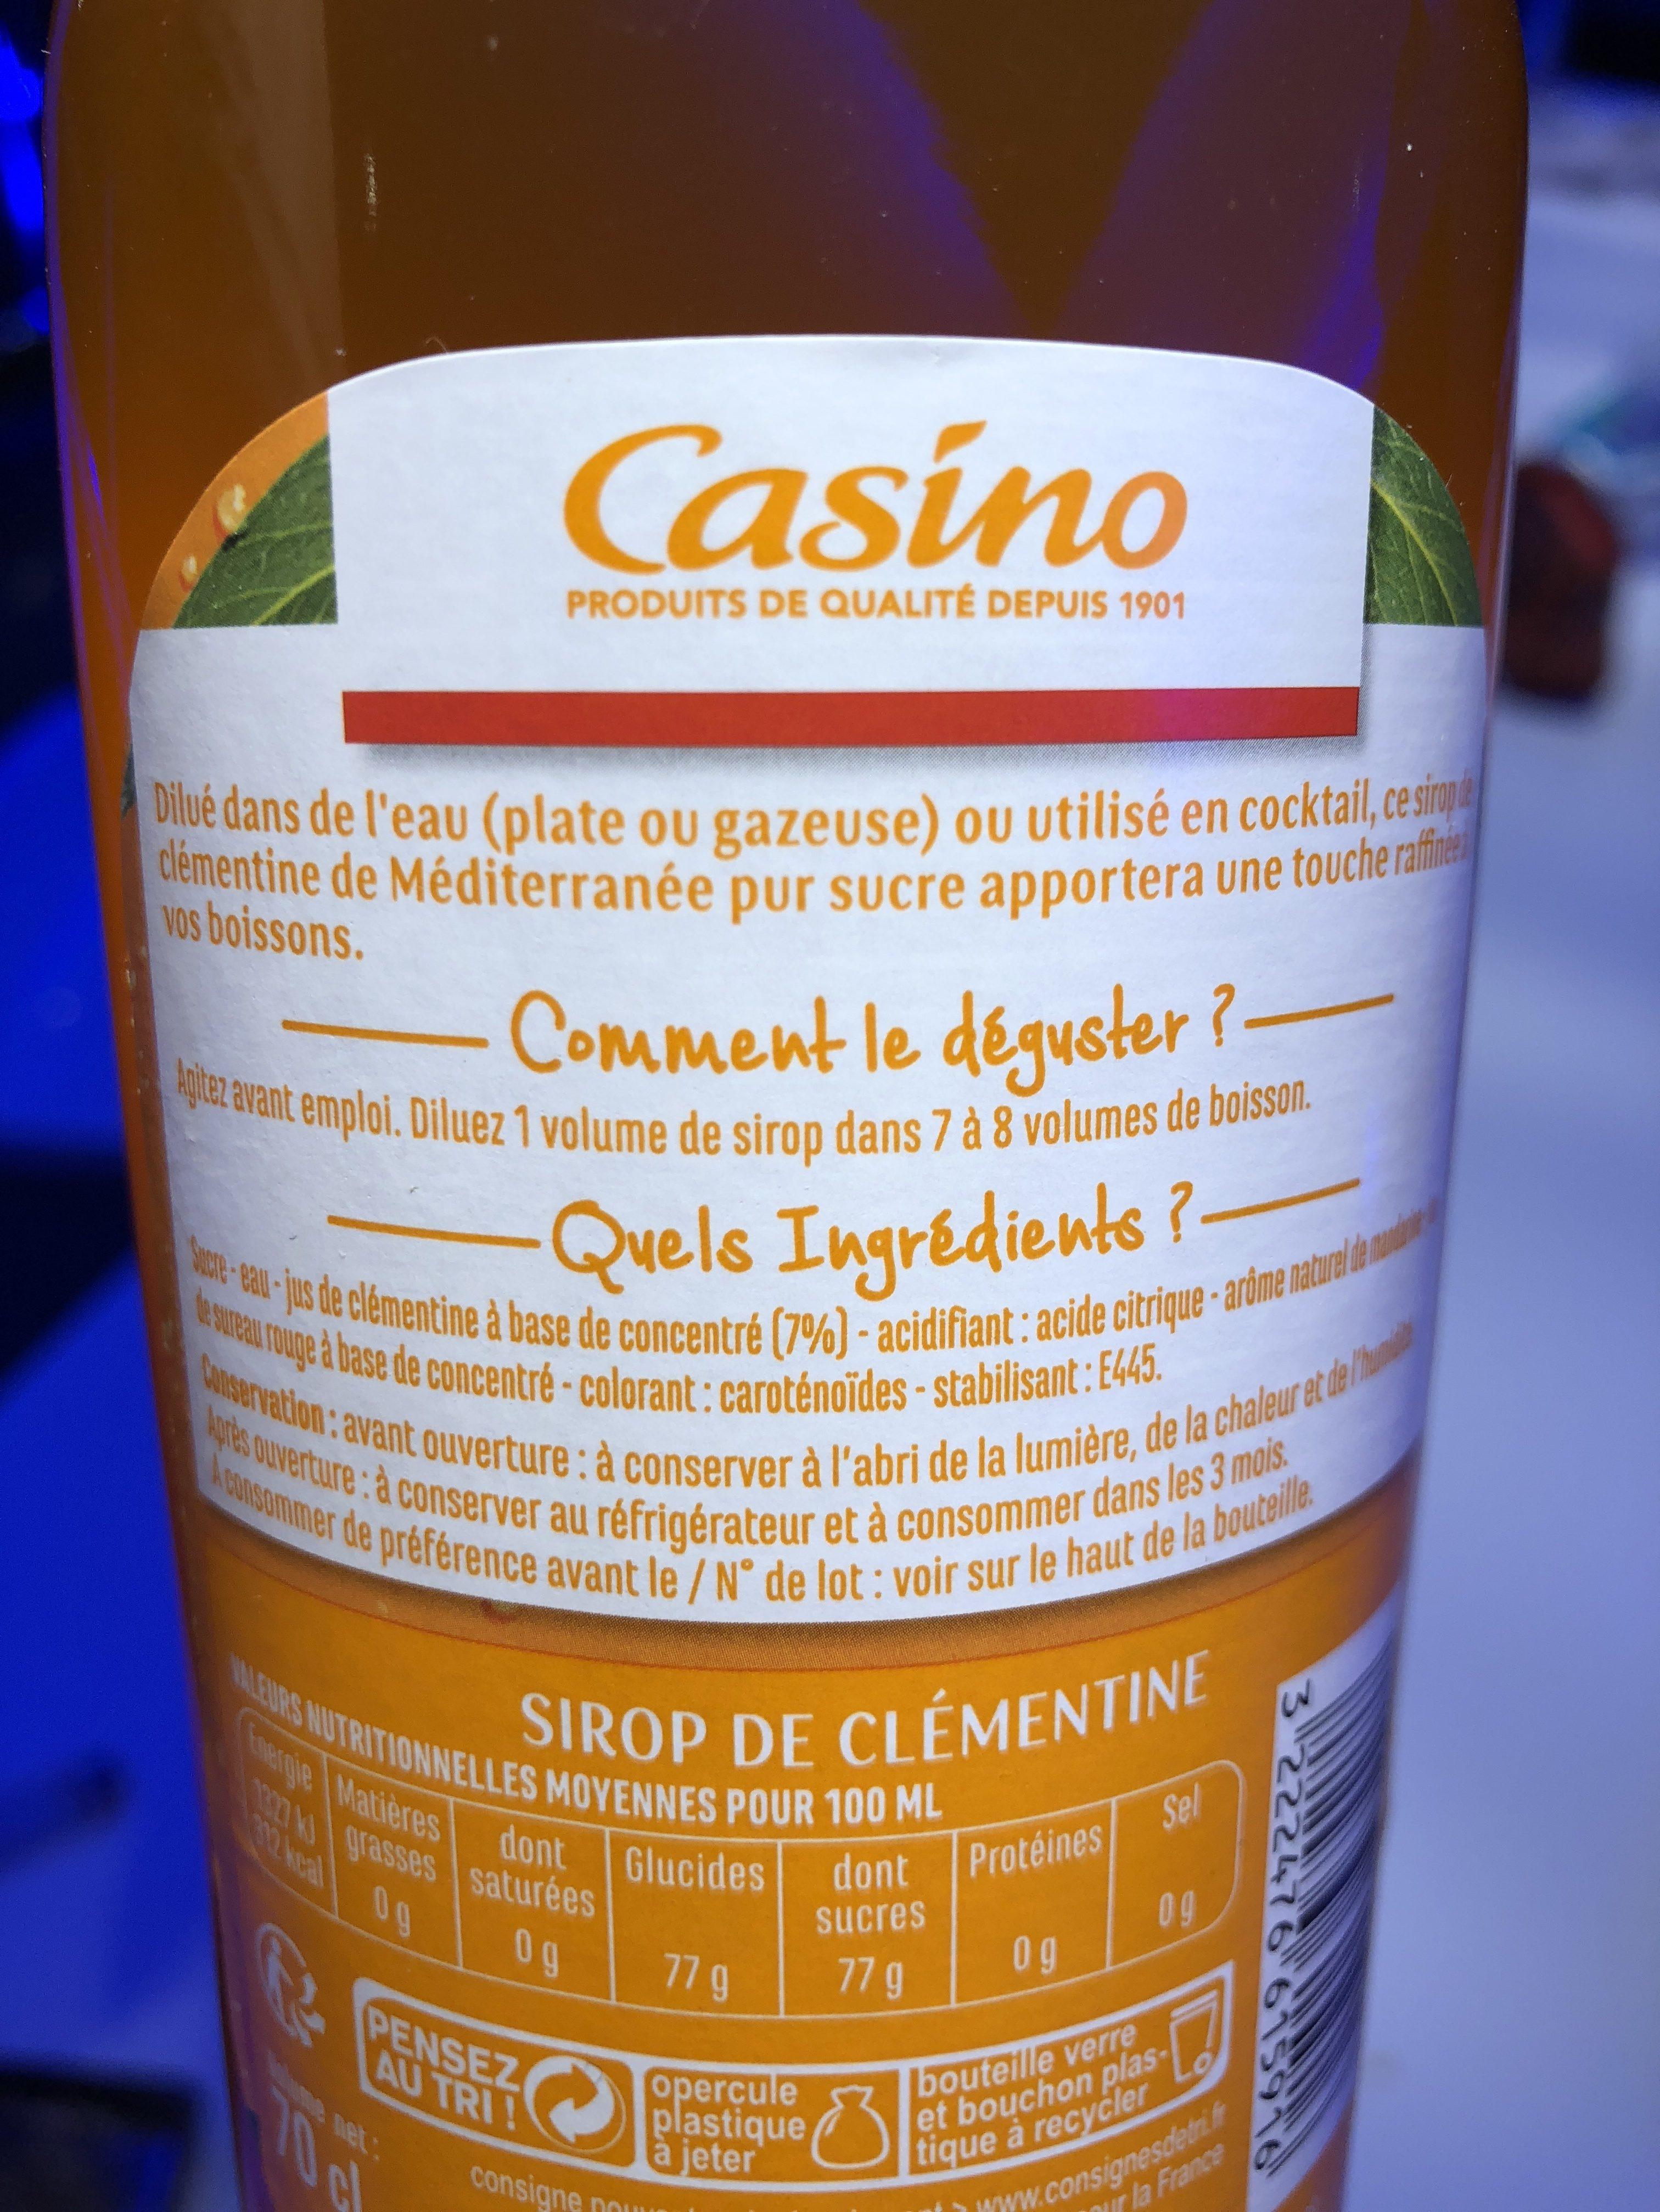 Sirop de clémentine pur sucre - Ingrediënten - fr